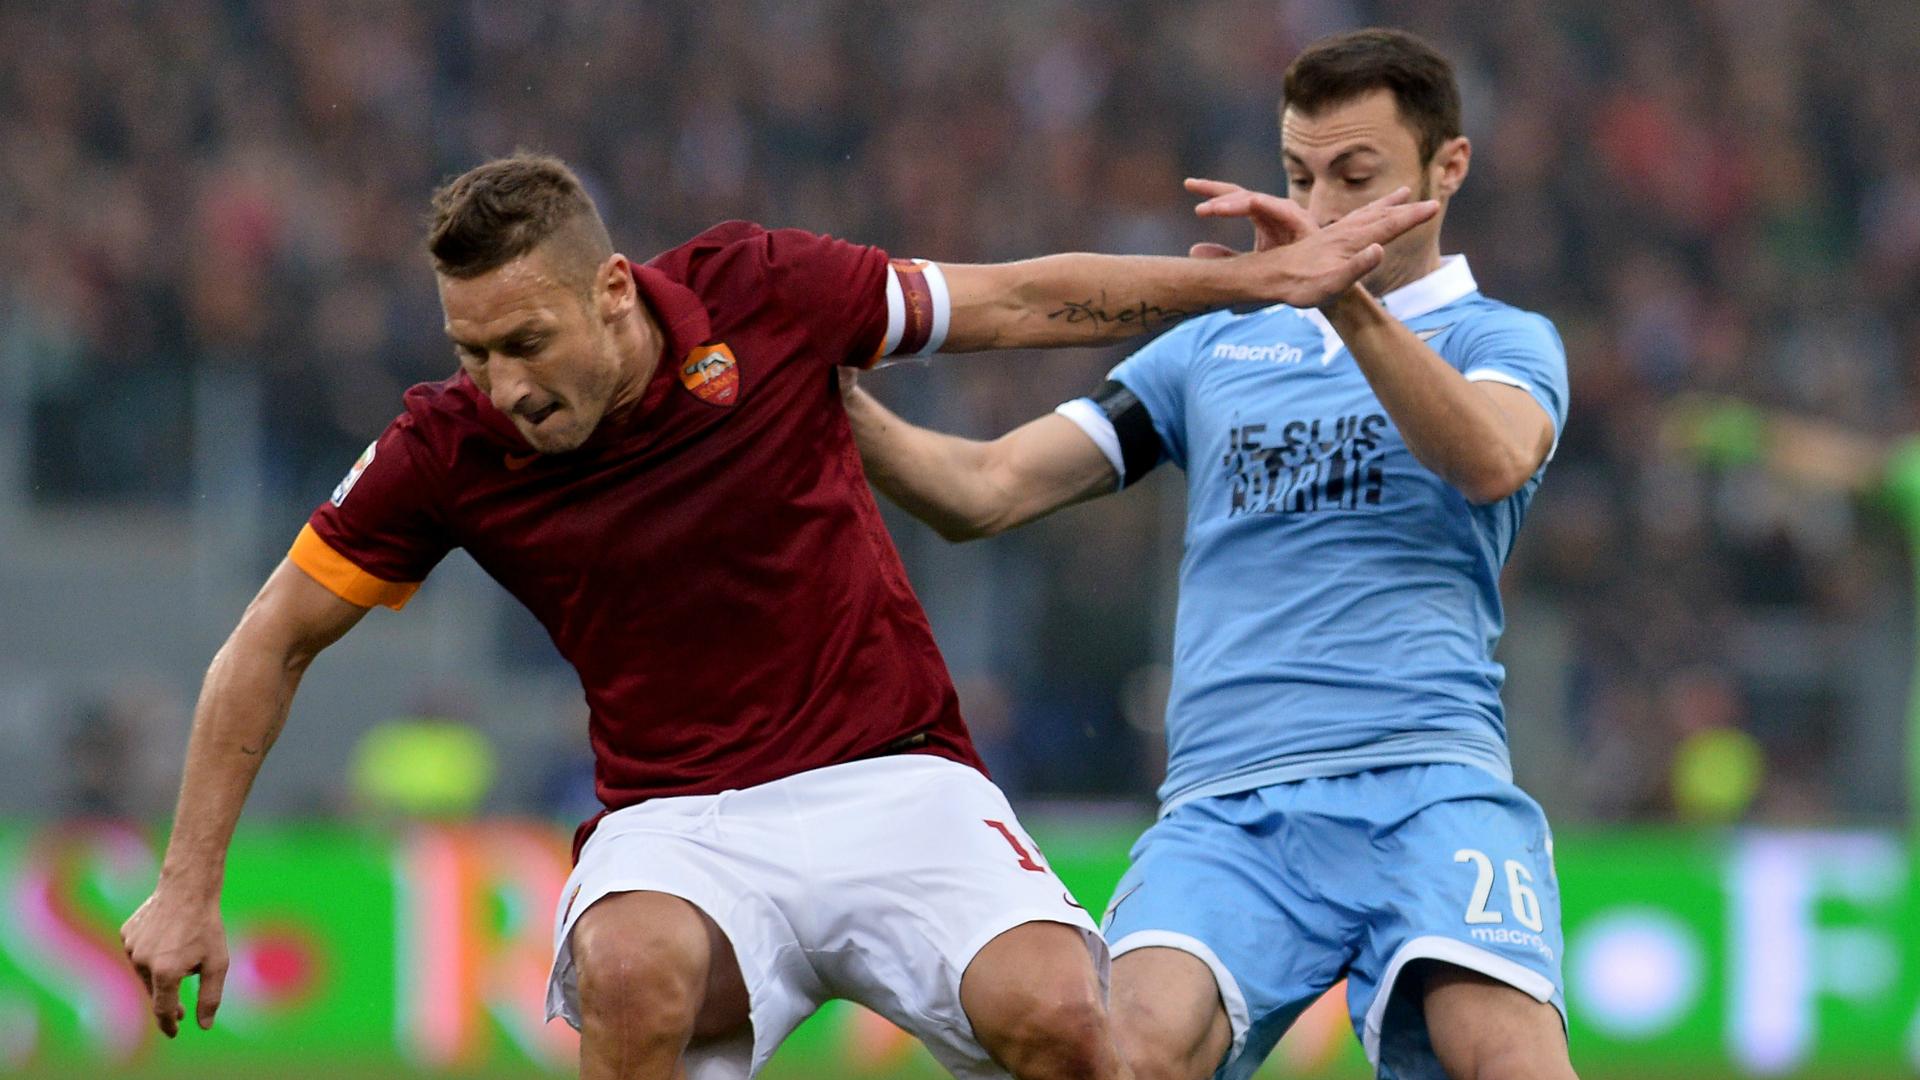 Totti Radu Roma Lazio Serie A